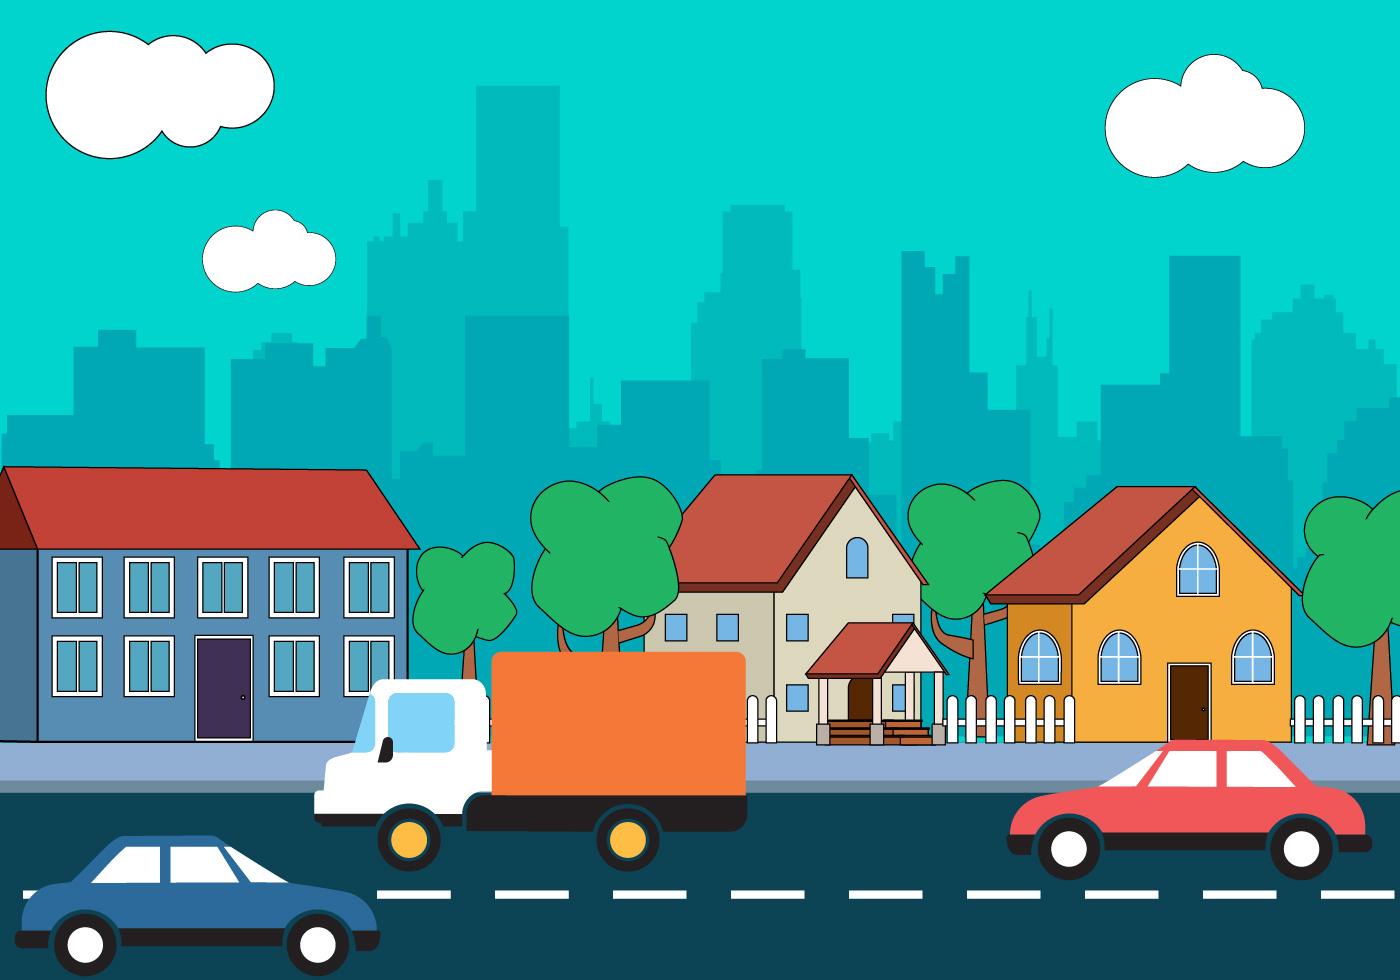 Town Landscape Vector Illustration: City Landscape Vector Design